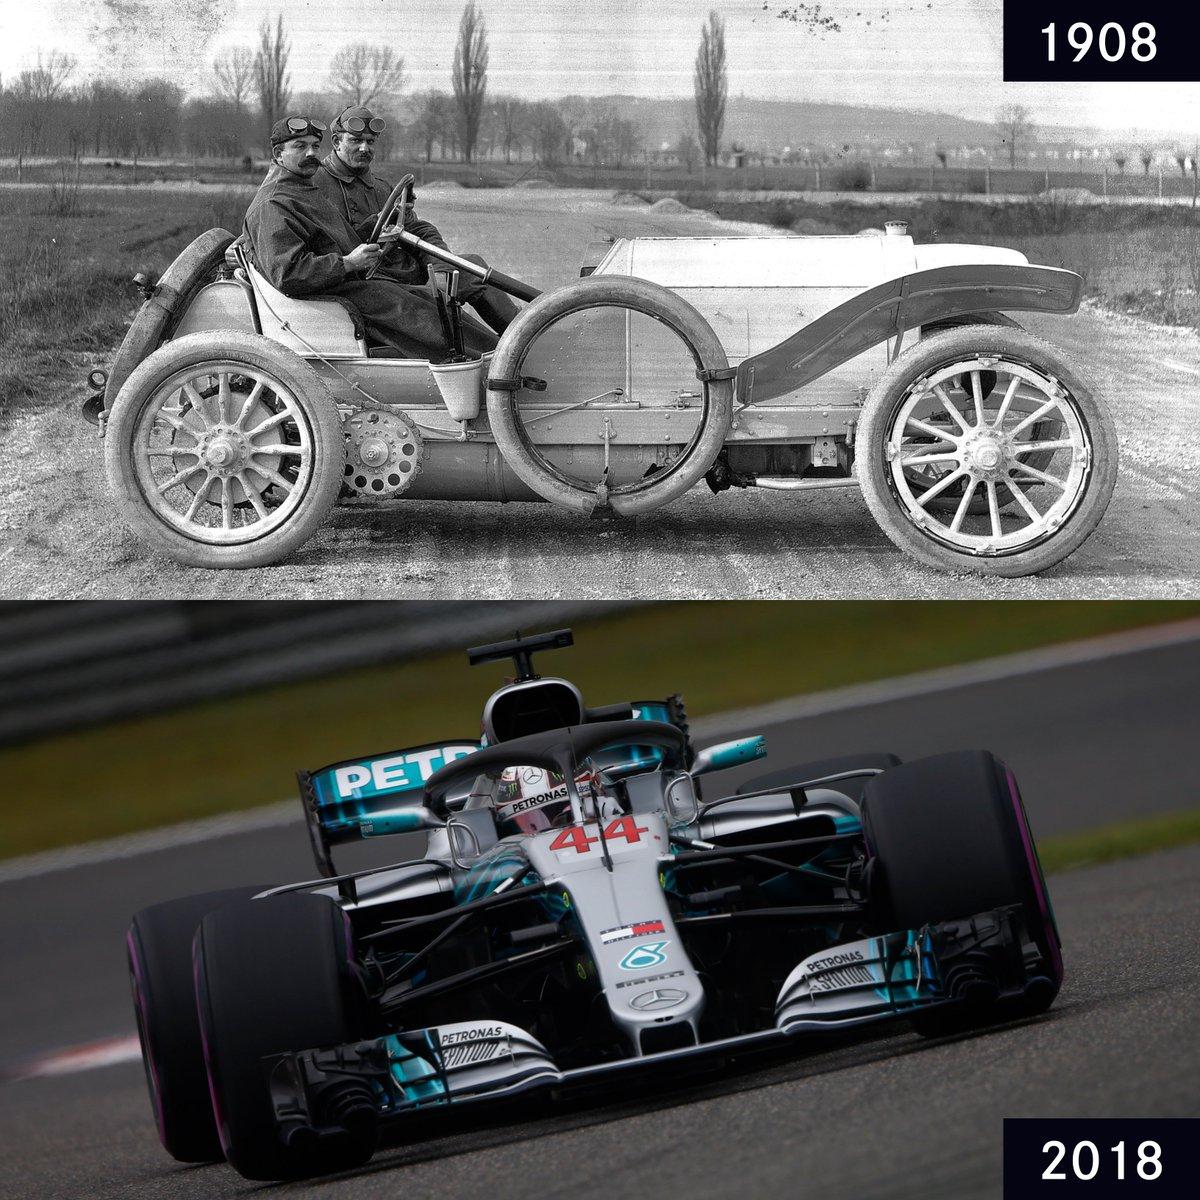 Mercedes Amg F1 Mercedesamgf1 Twitter